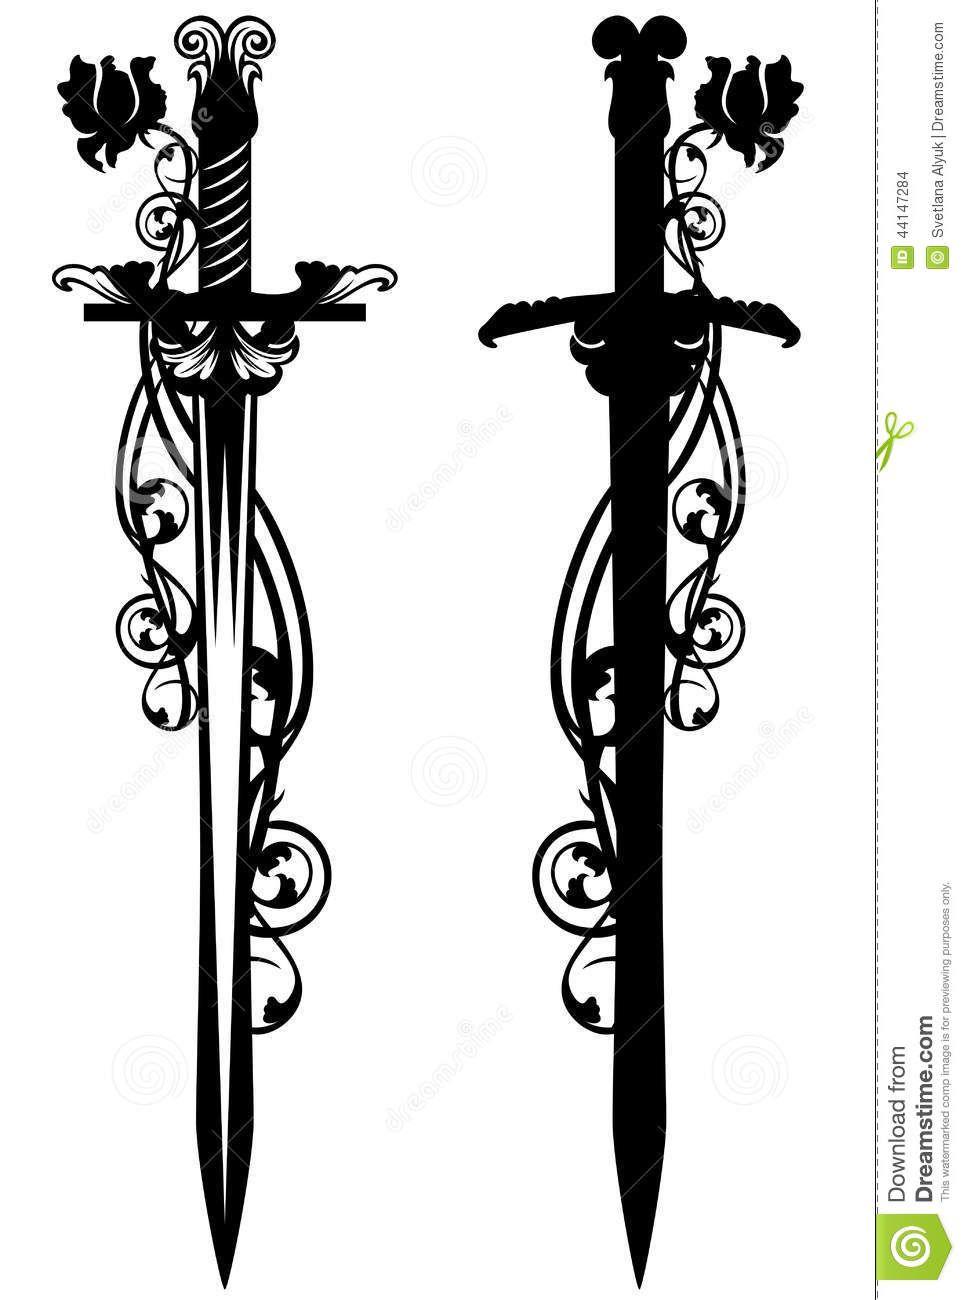 Dagger tattoo meanings itattoodesigns - Pix For Arabian Sword Tattoo More